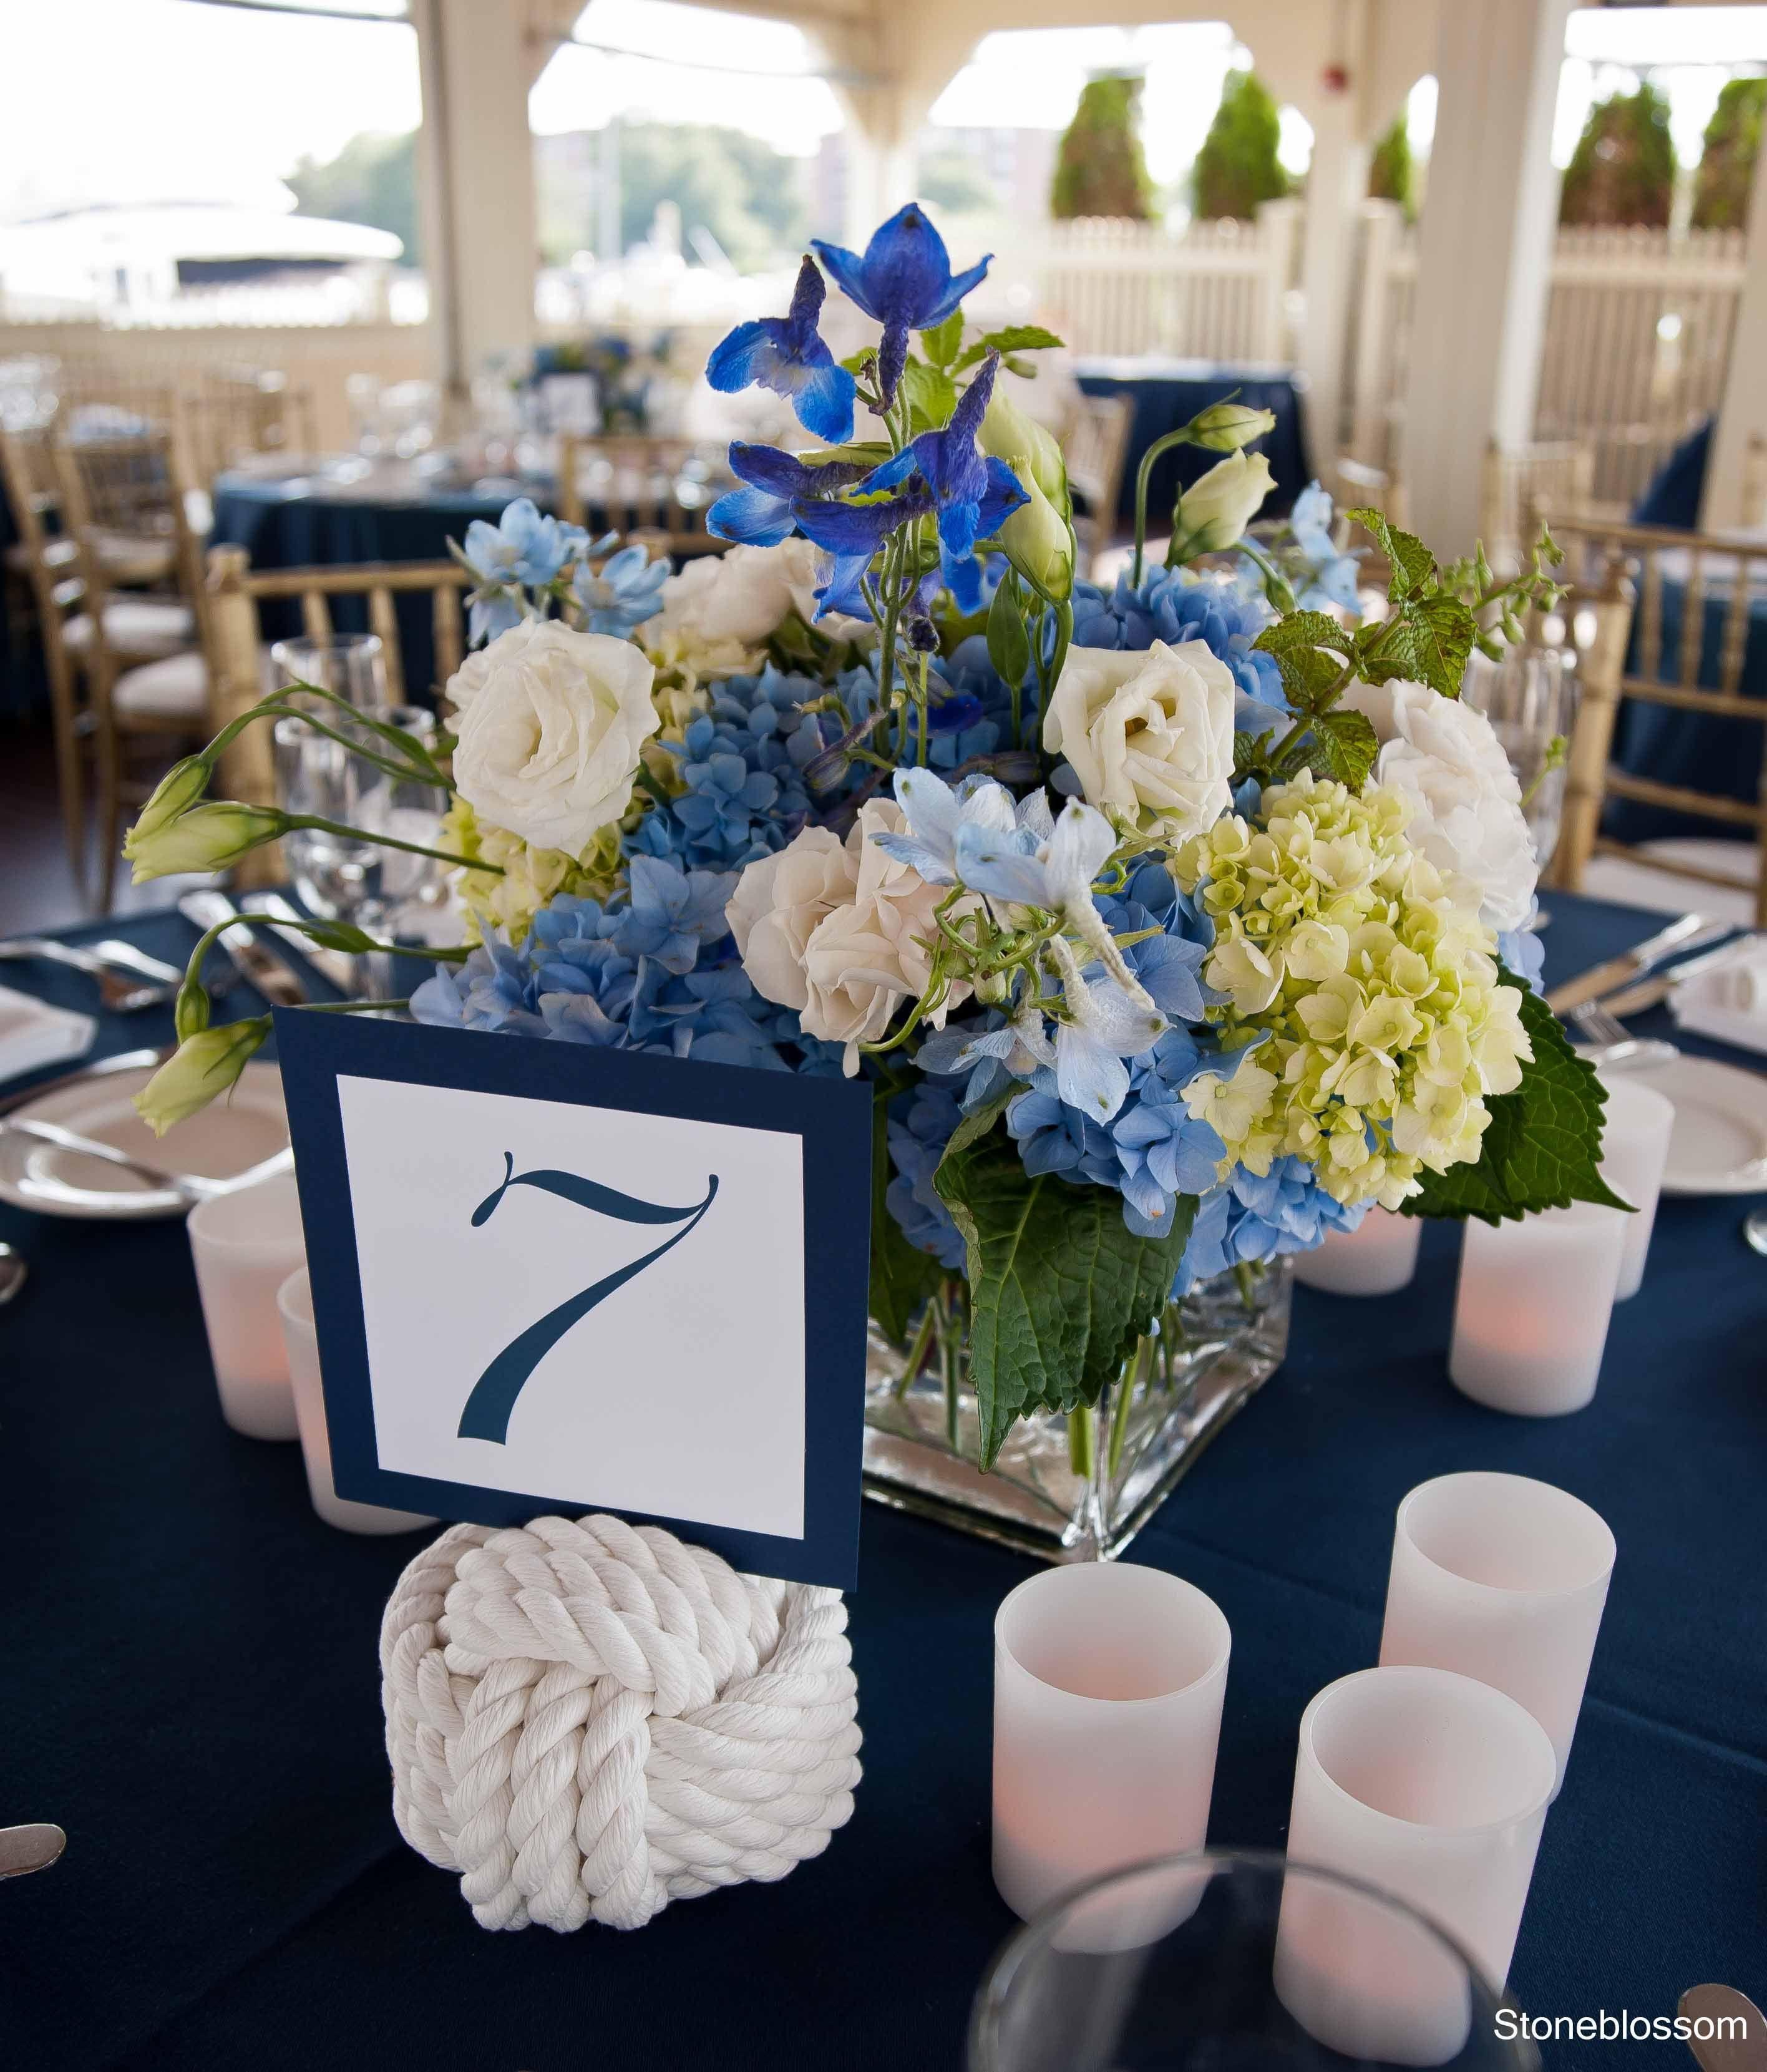 Flower Aisle Wedding: Blue And Green Hydrangea Wedding Aisle Flower Décor